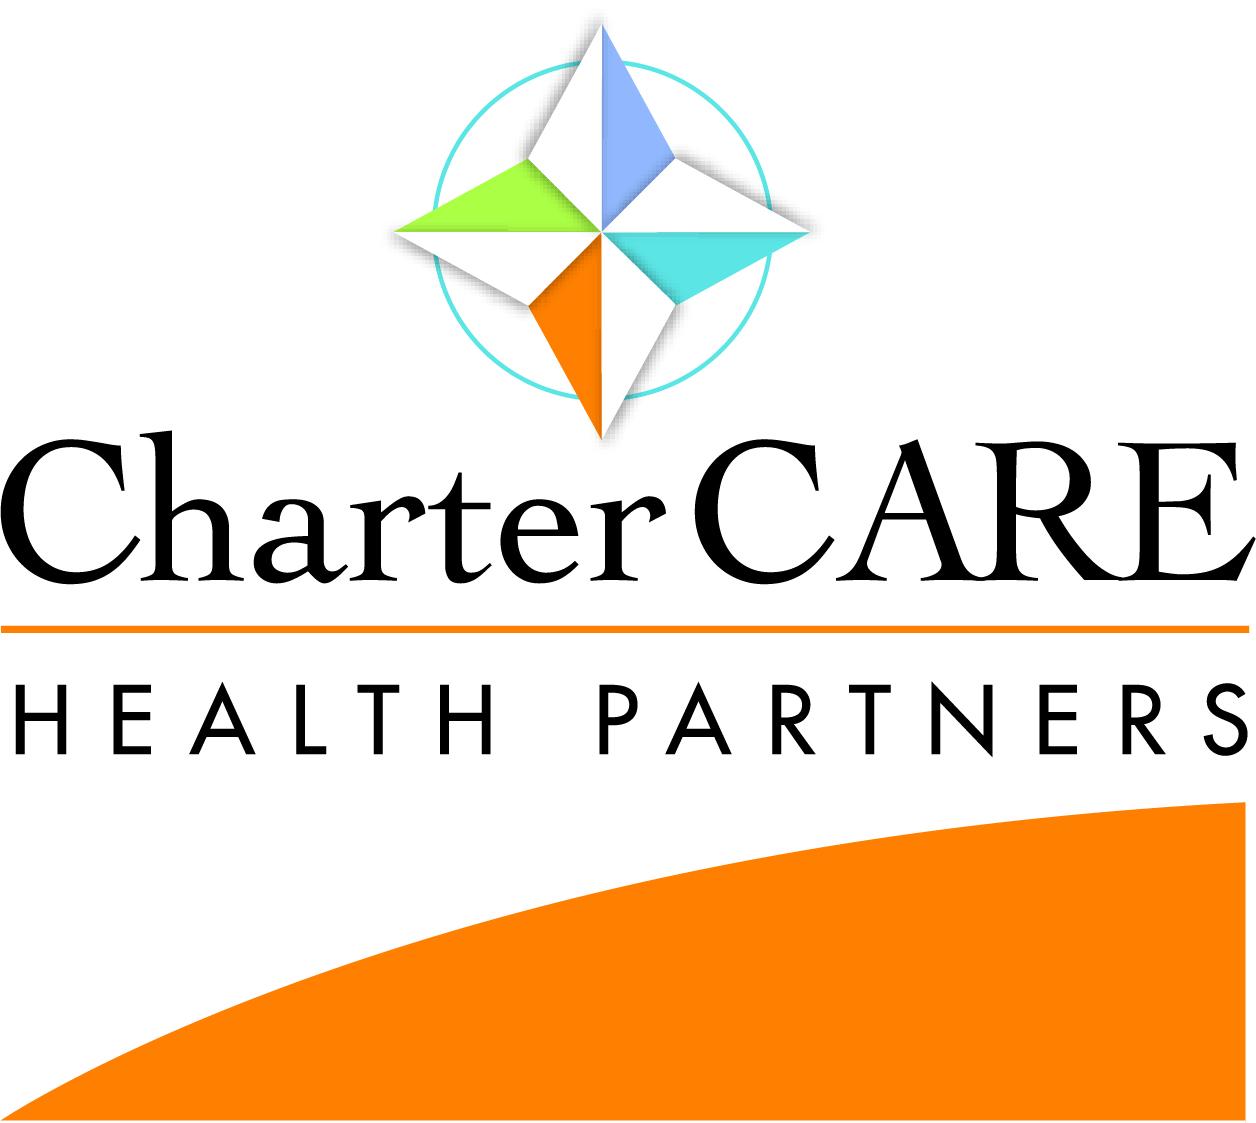 CharterCARE